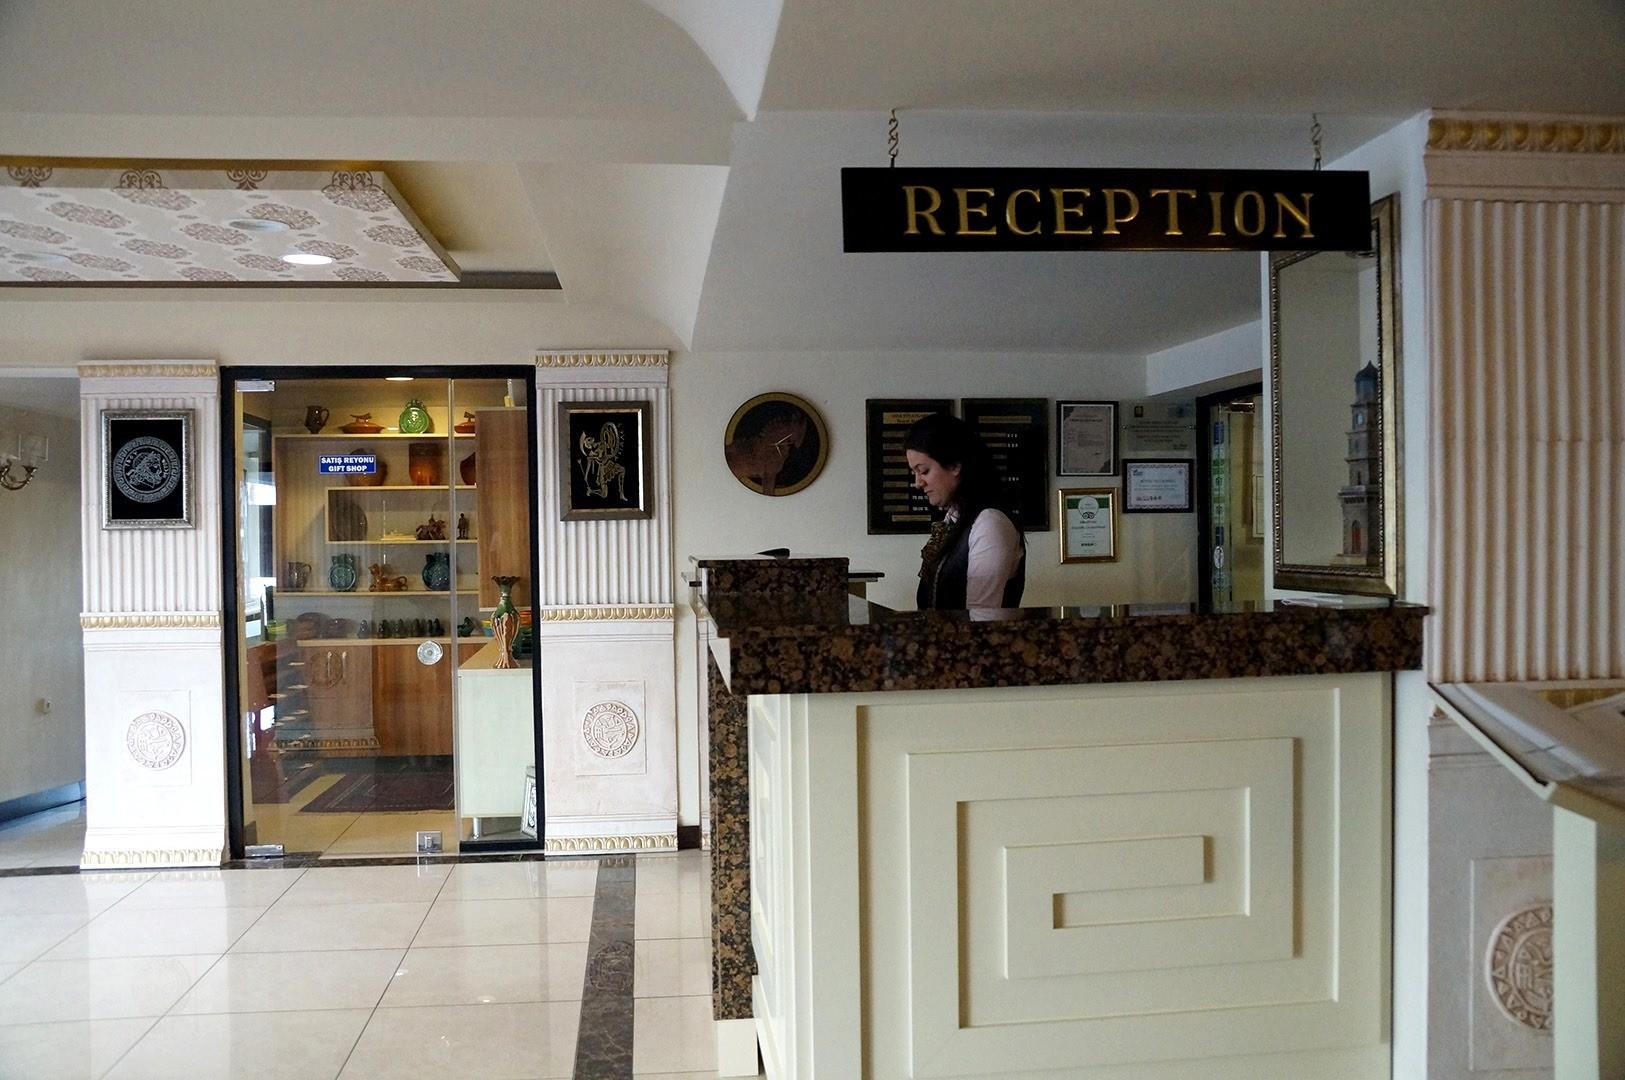 Хотел Buyuk Truva 4* - рецепция